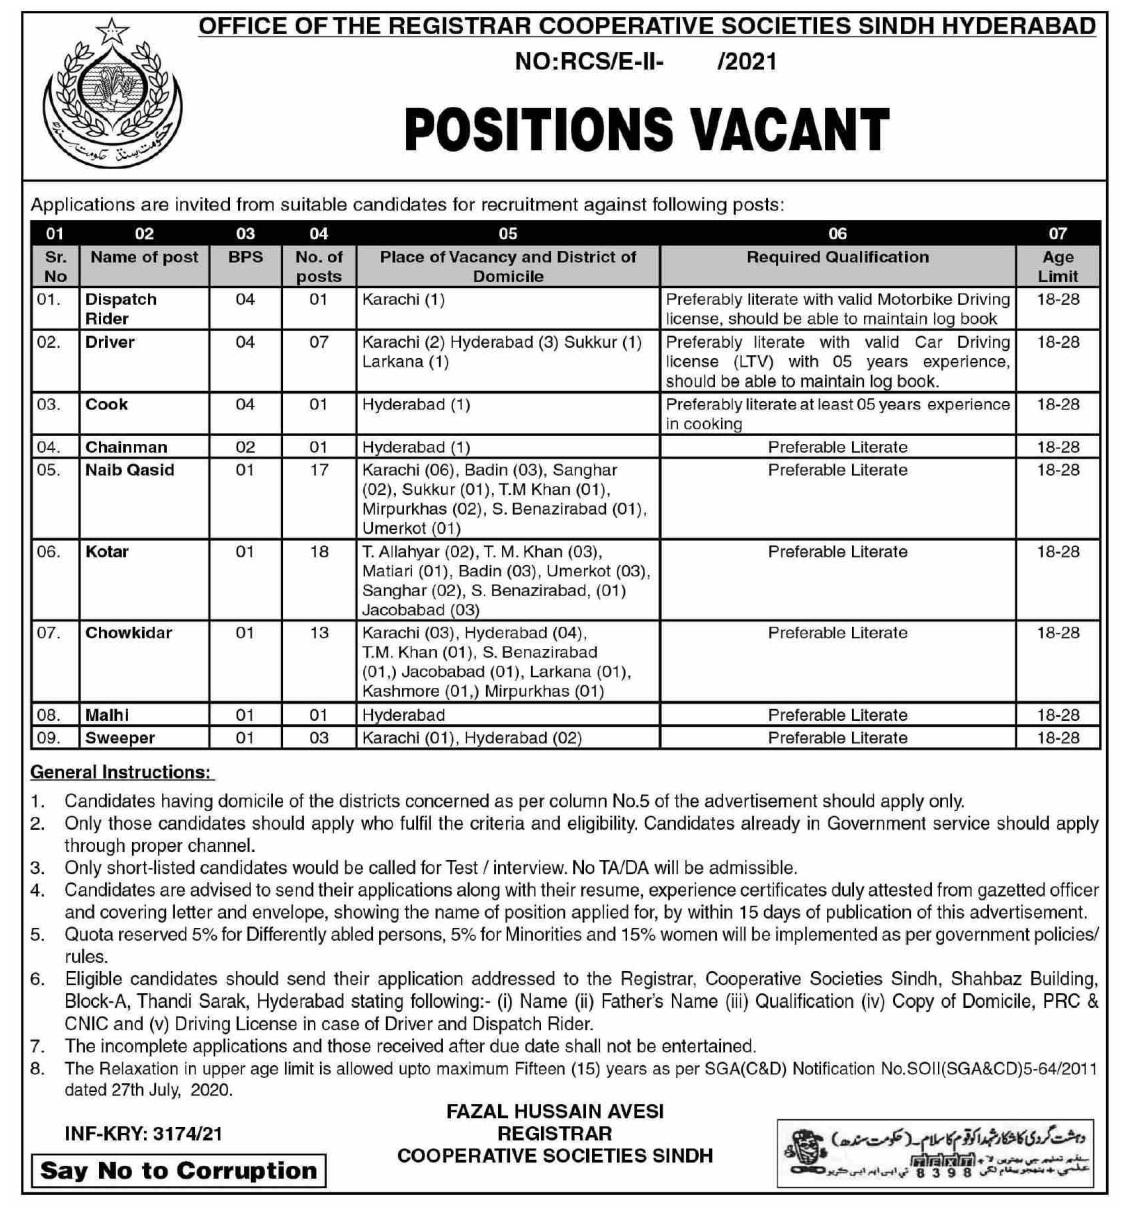 Office of The Registrar Cooperative Societies Sindh Hyderabad Jobs 2021